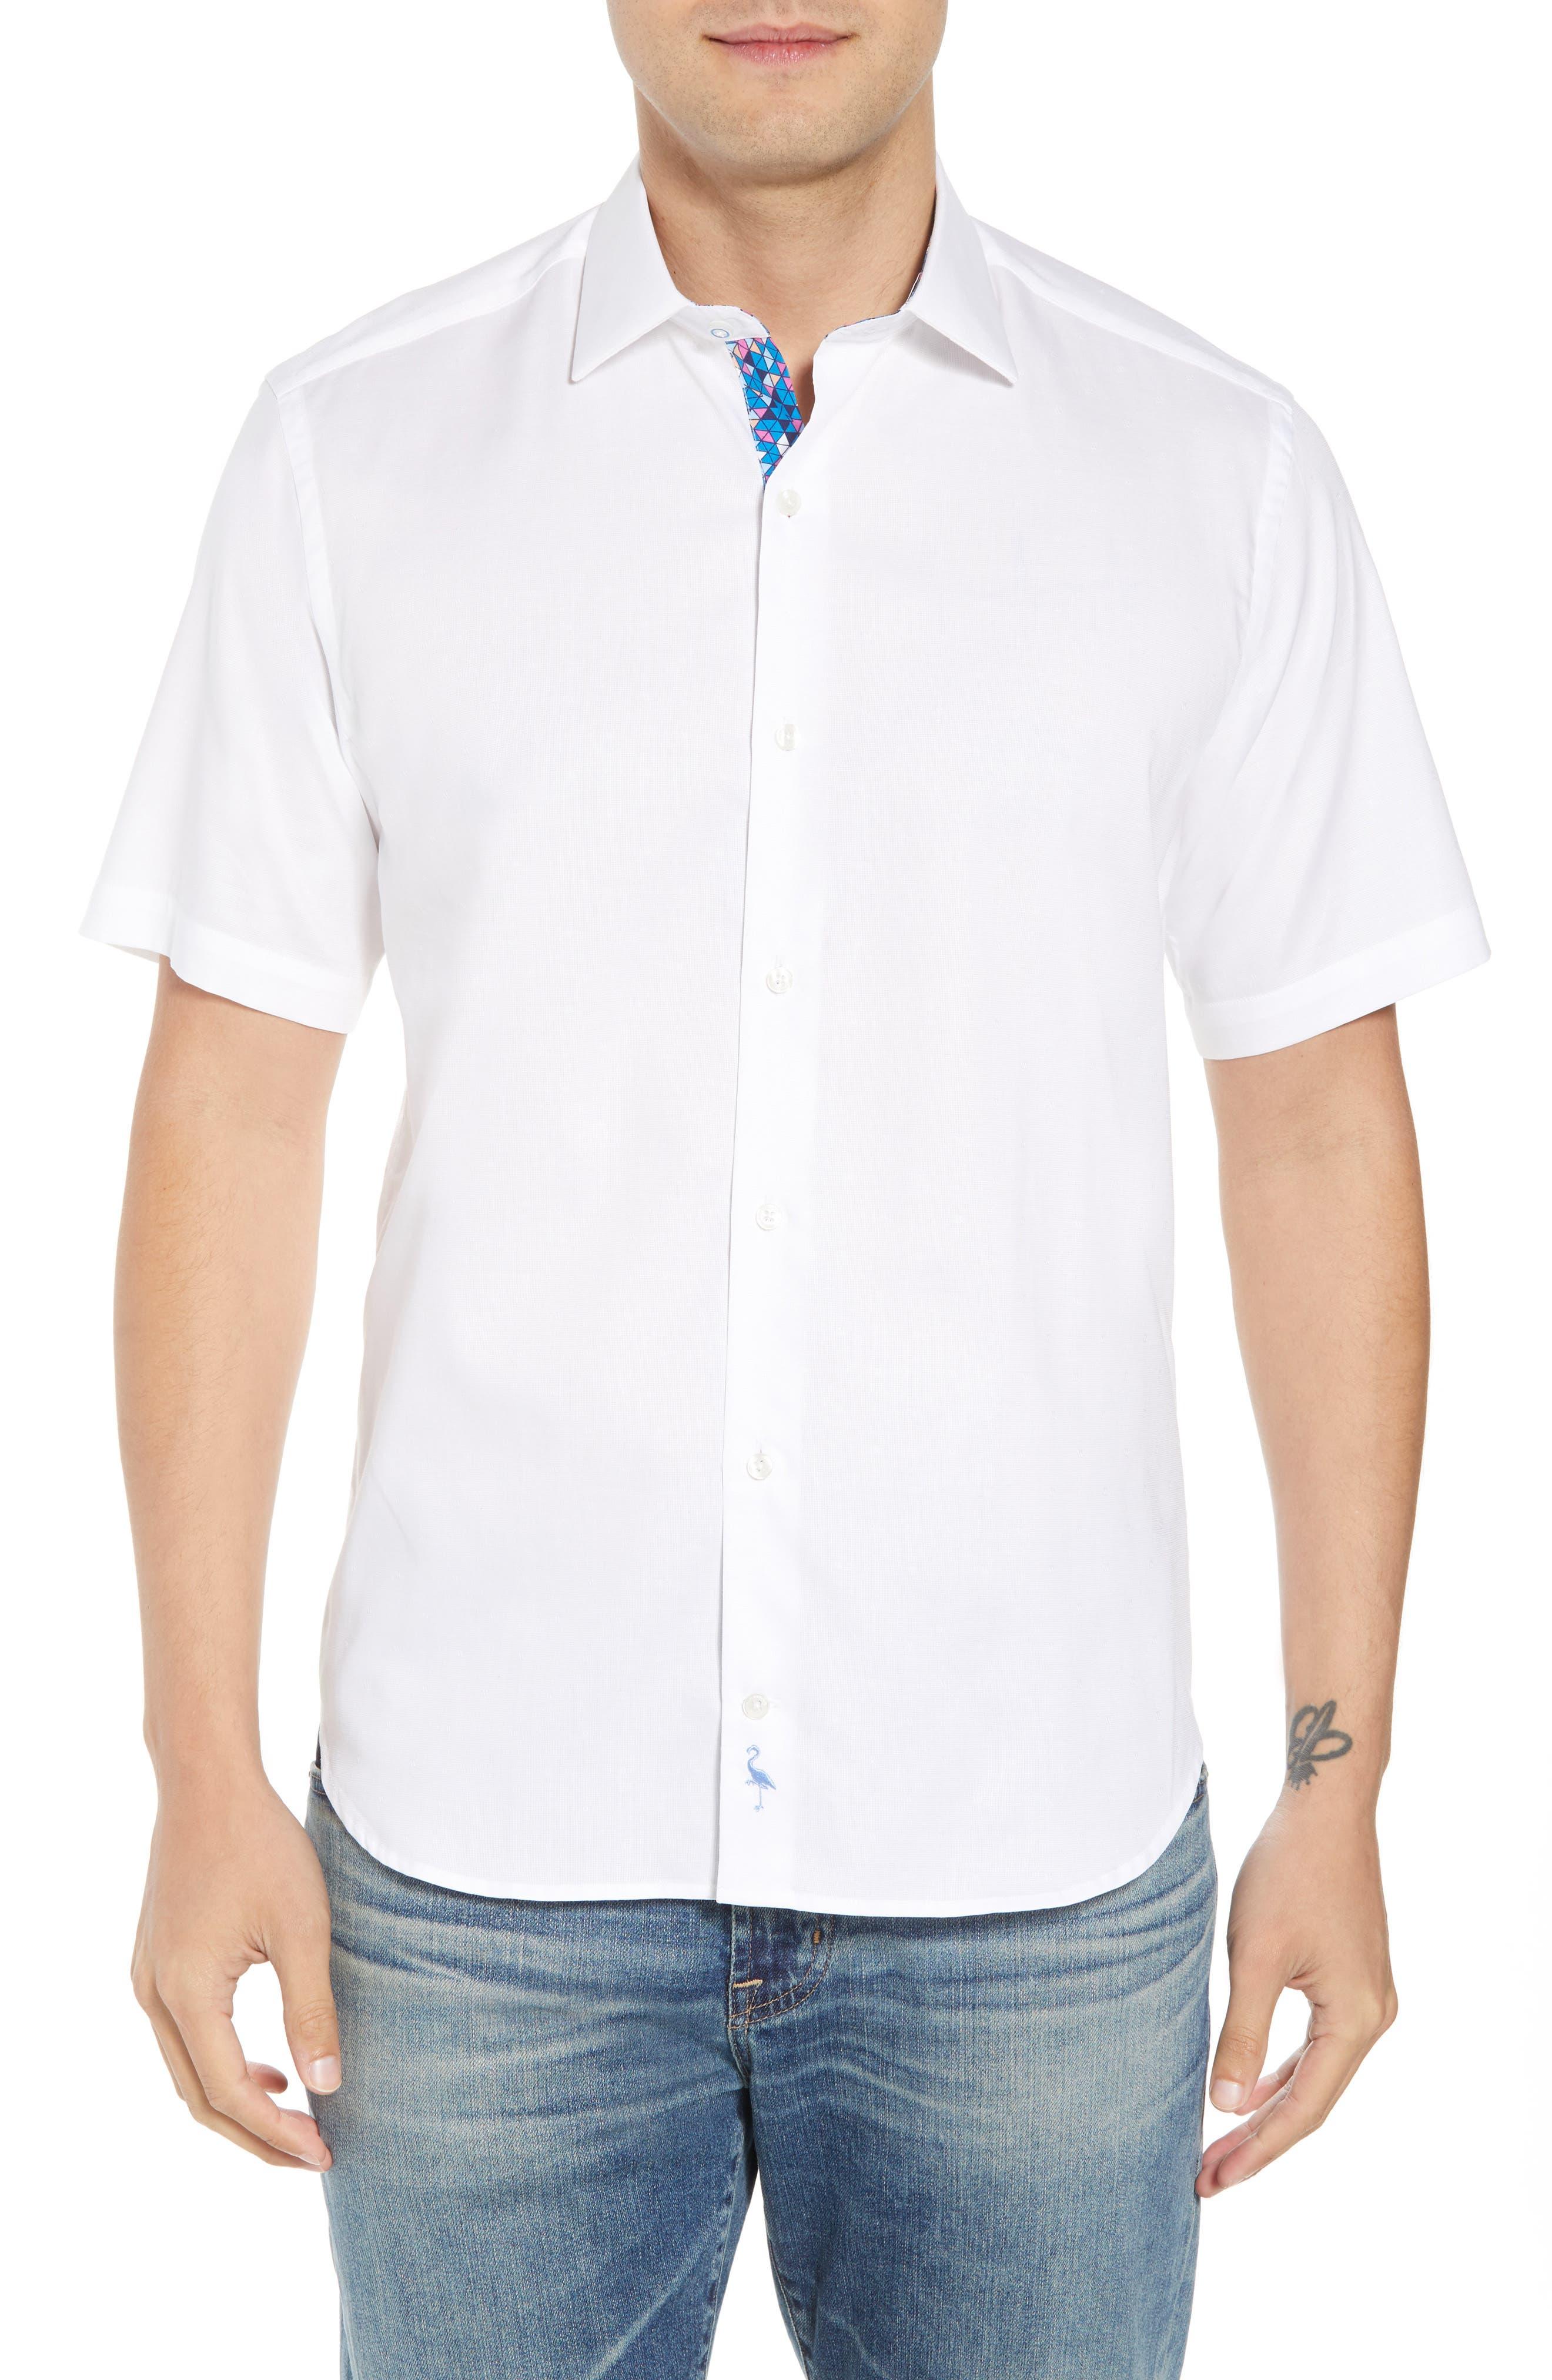 Arlen Regular Fit Sport Shirt,                         Main,                         color,